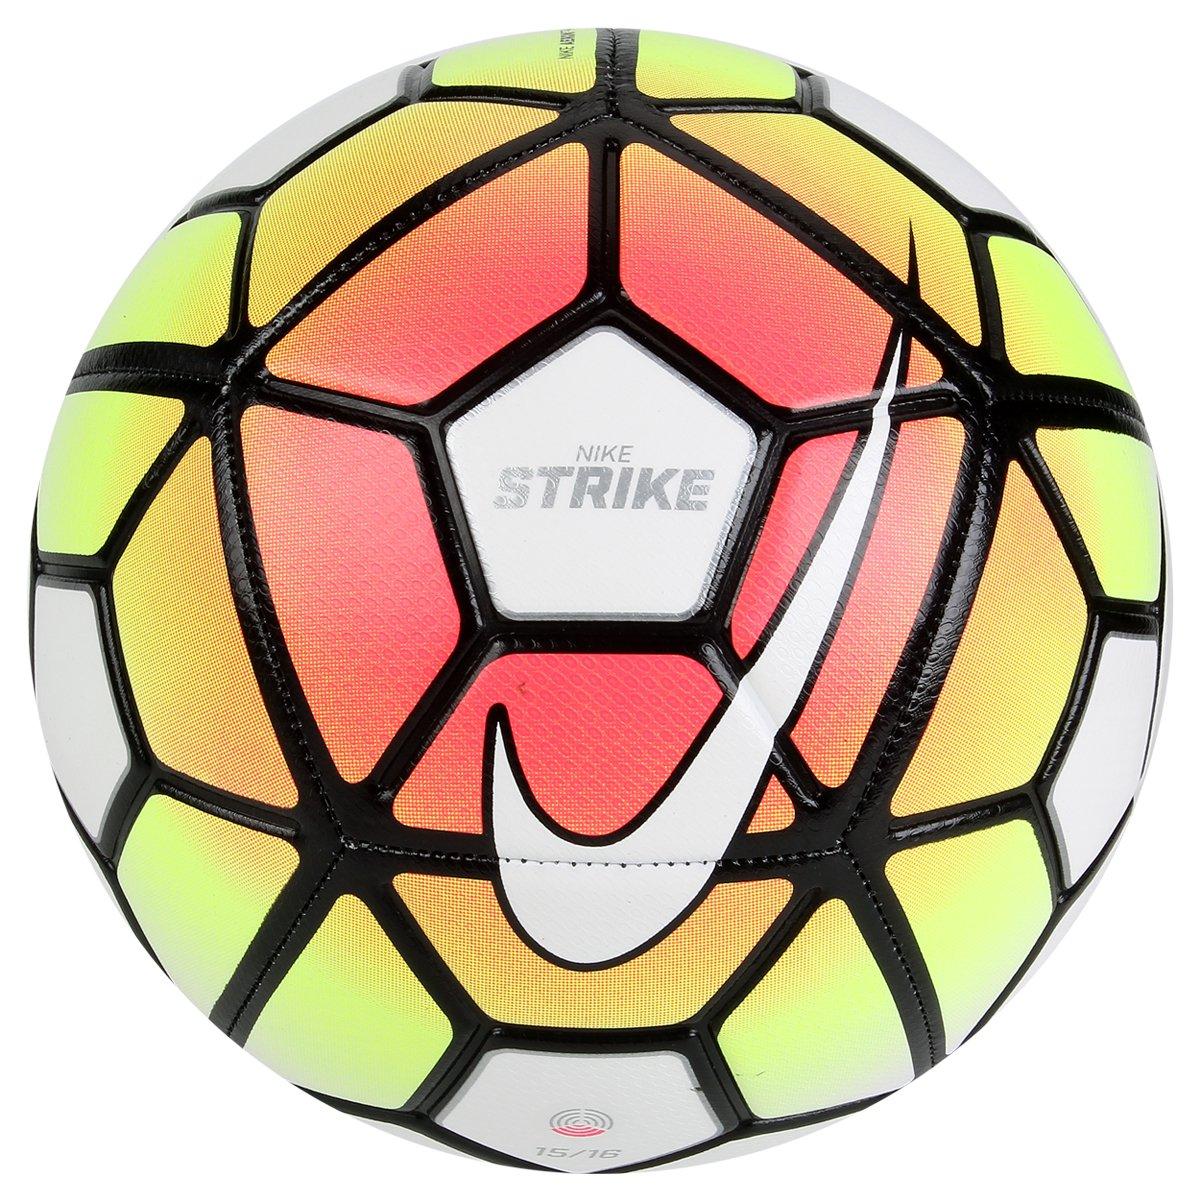 Bola Futebol Nike Strike Campo - Compre Agora  aee3530ad92a4